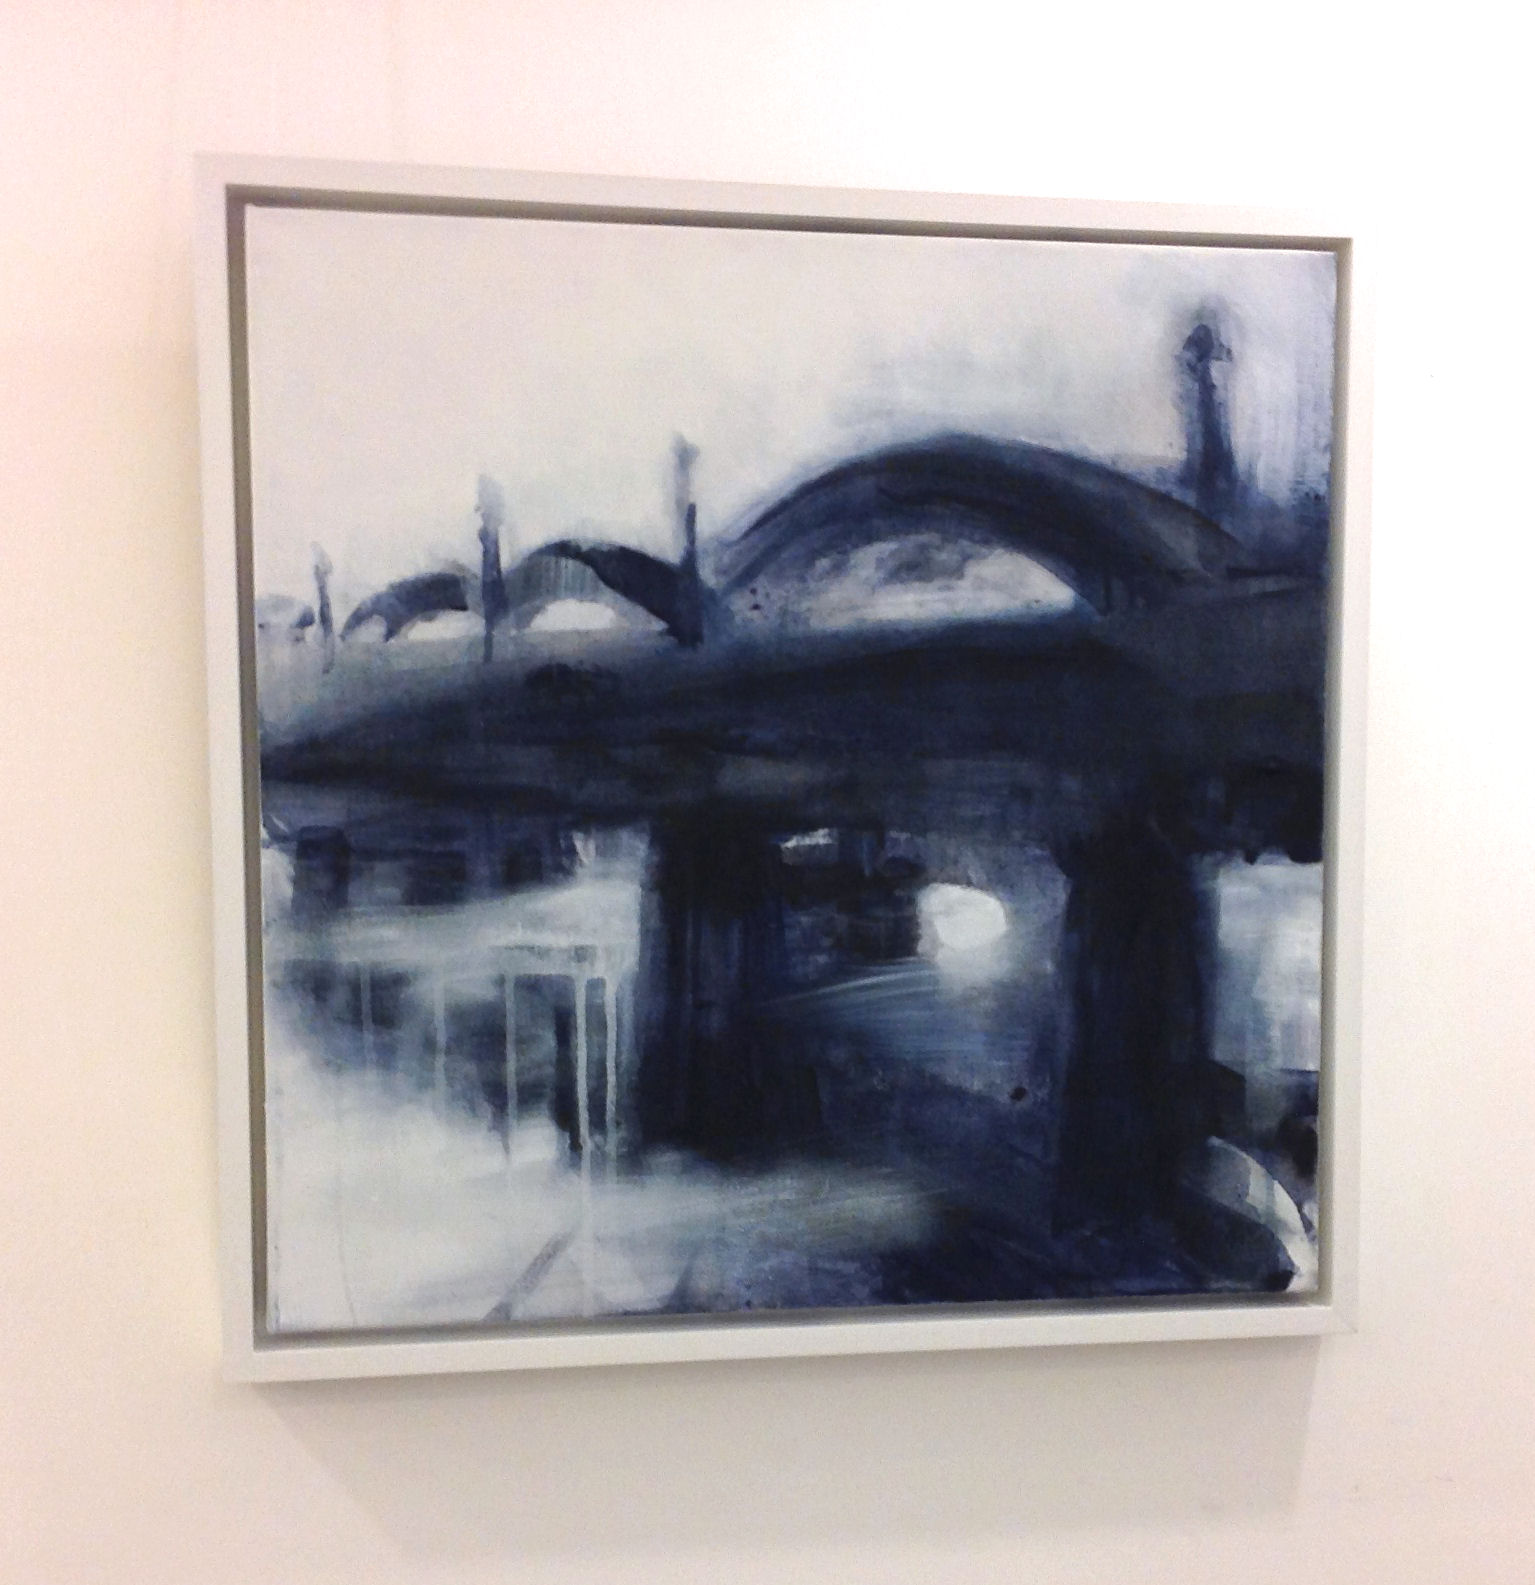 'The Bridge, High Tide Rain' by artist Jim Campbell